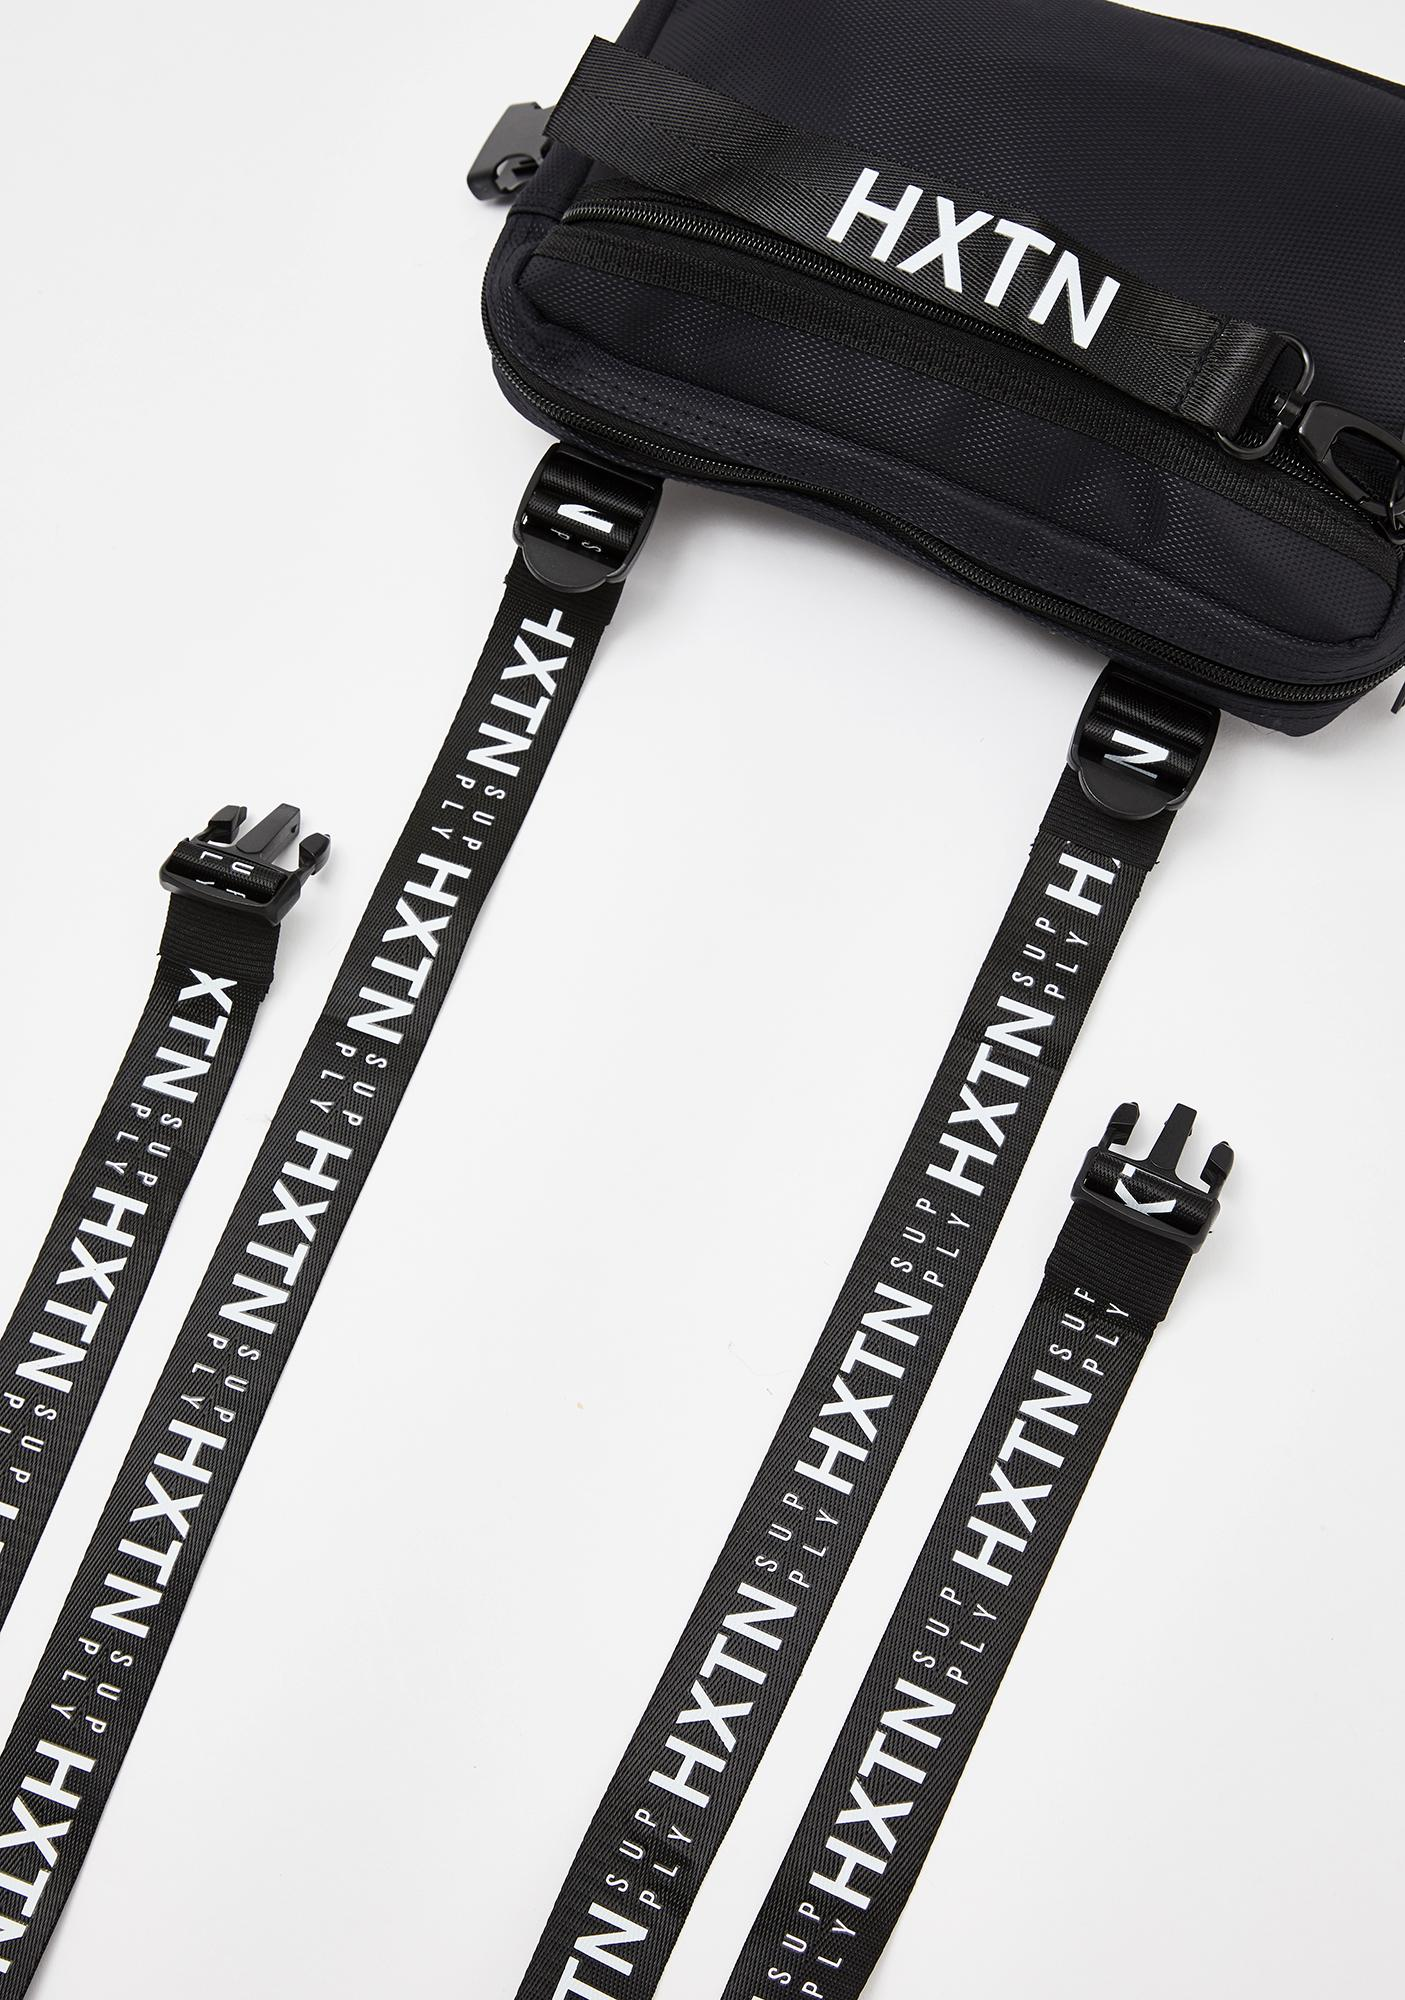 HXTN Supply Delta 002 Body Bag